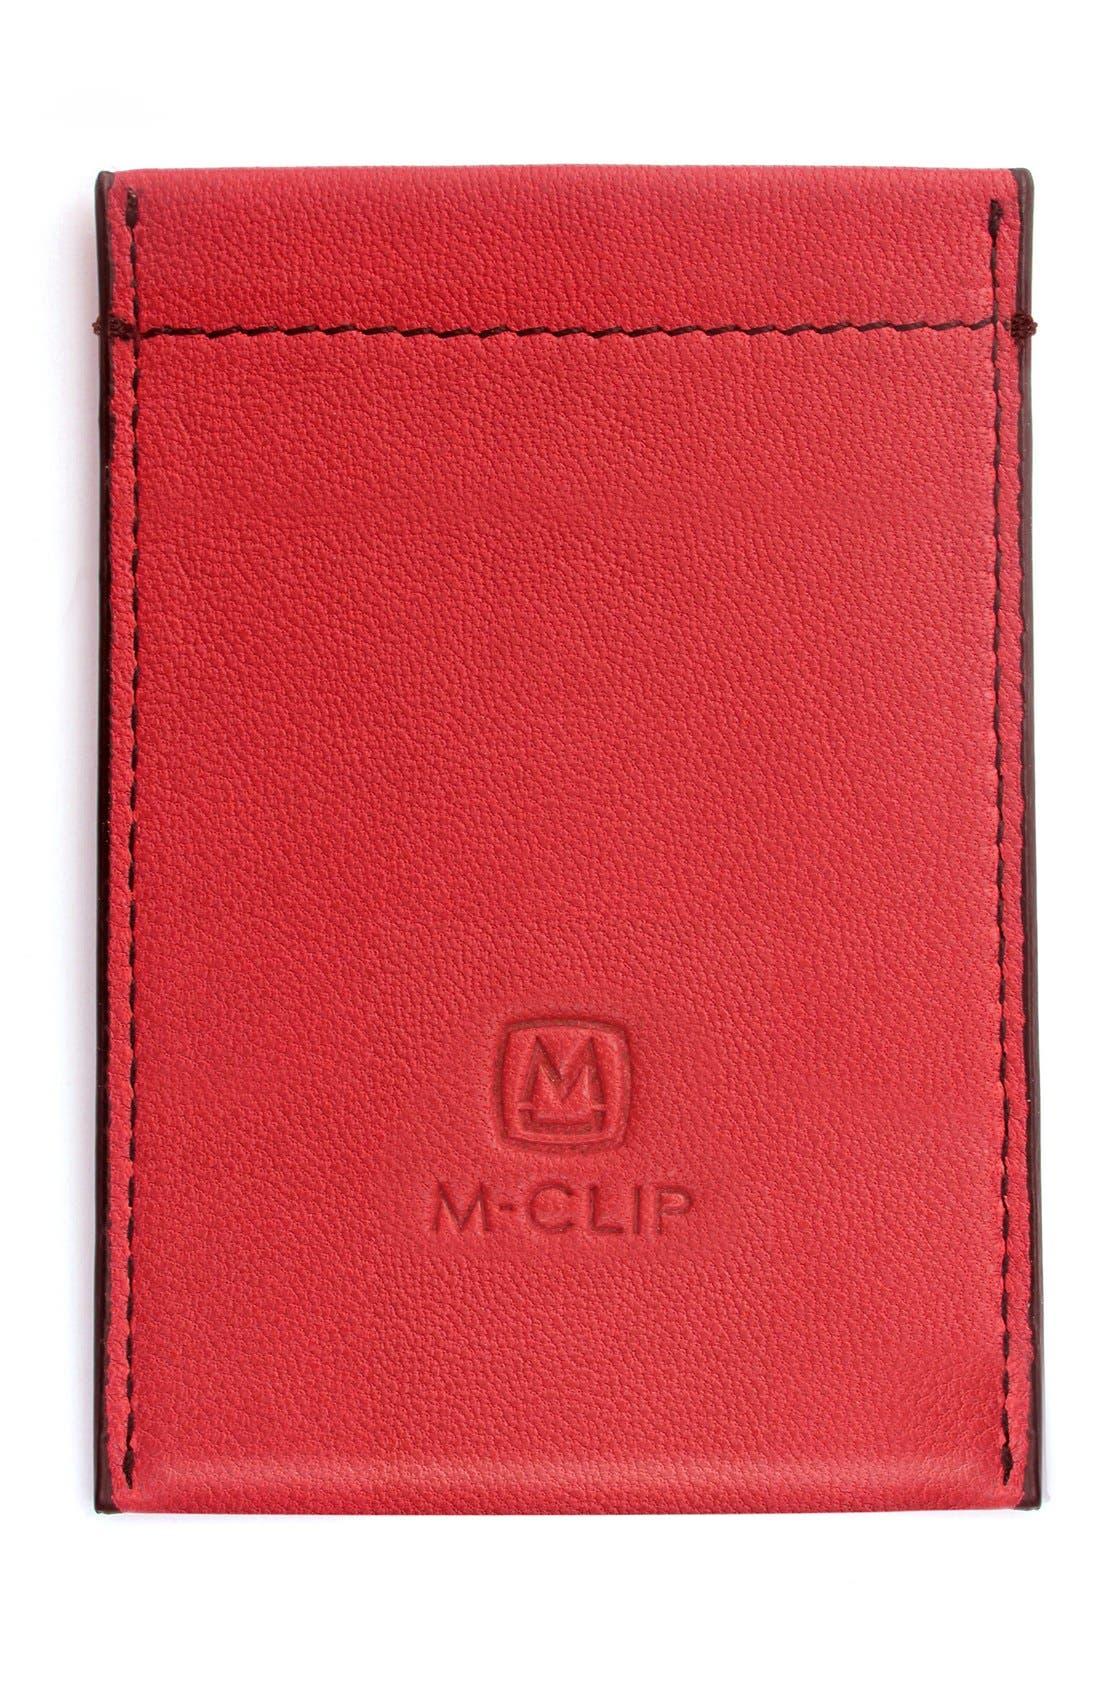 Main Image - M-Clip® RFID Card Case